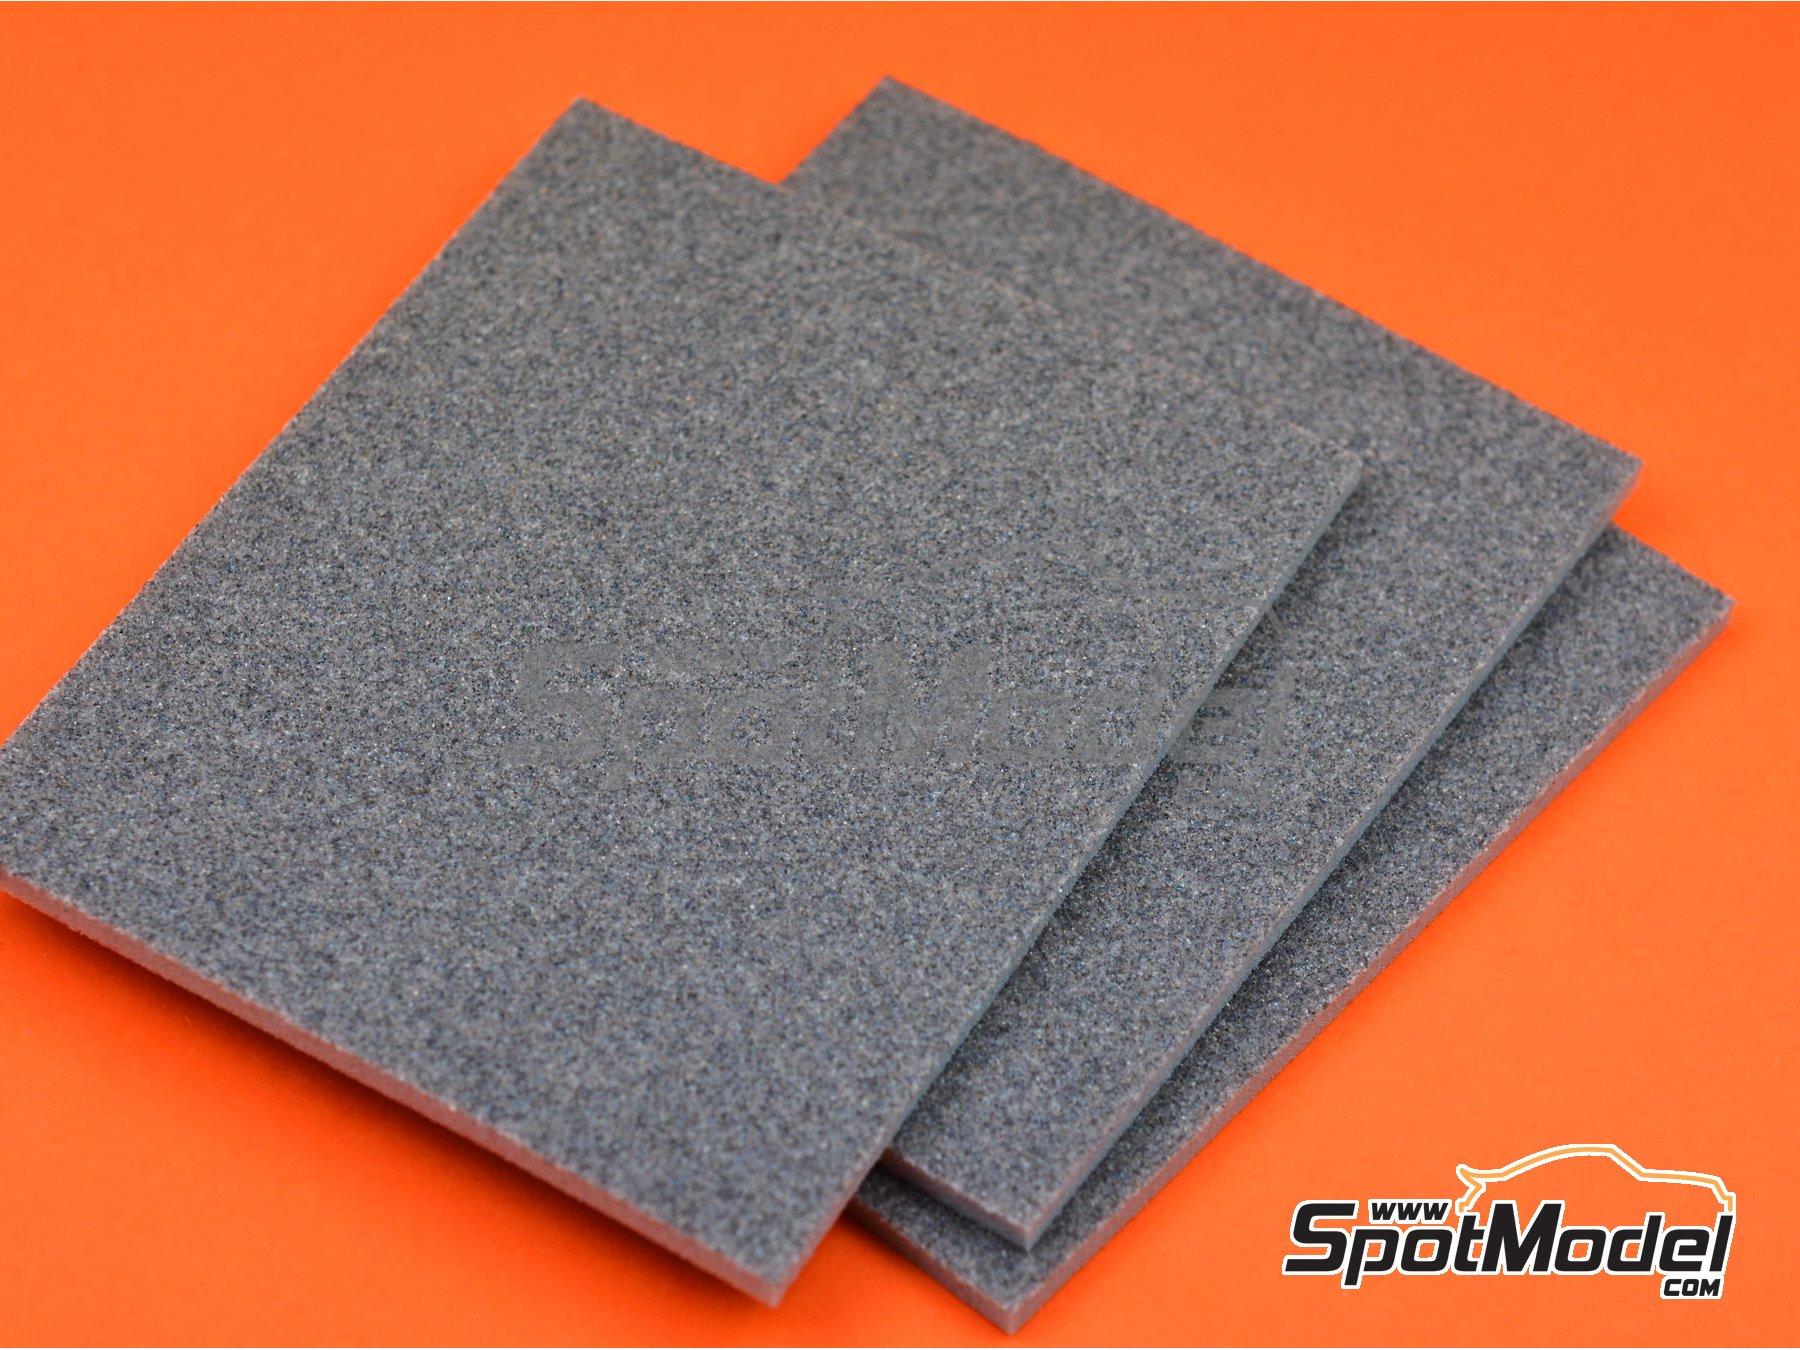 Image 1: Medium sand sponge | Sandpaper manufactured by SpotModel (ref.SPOT-012)